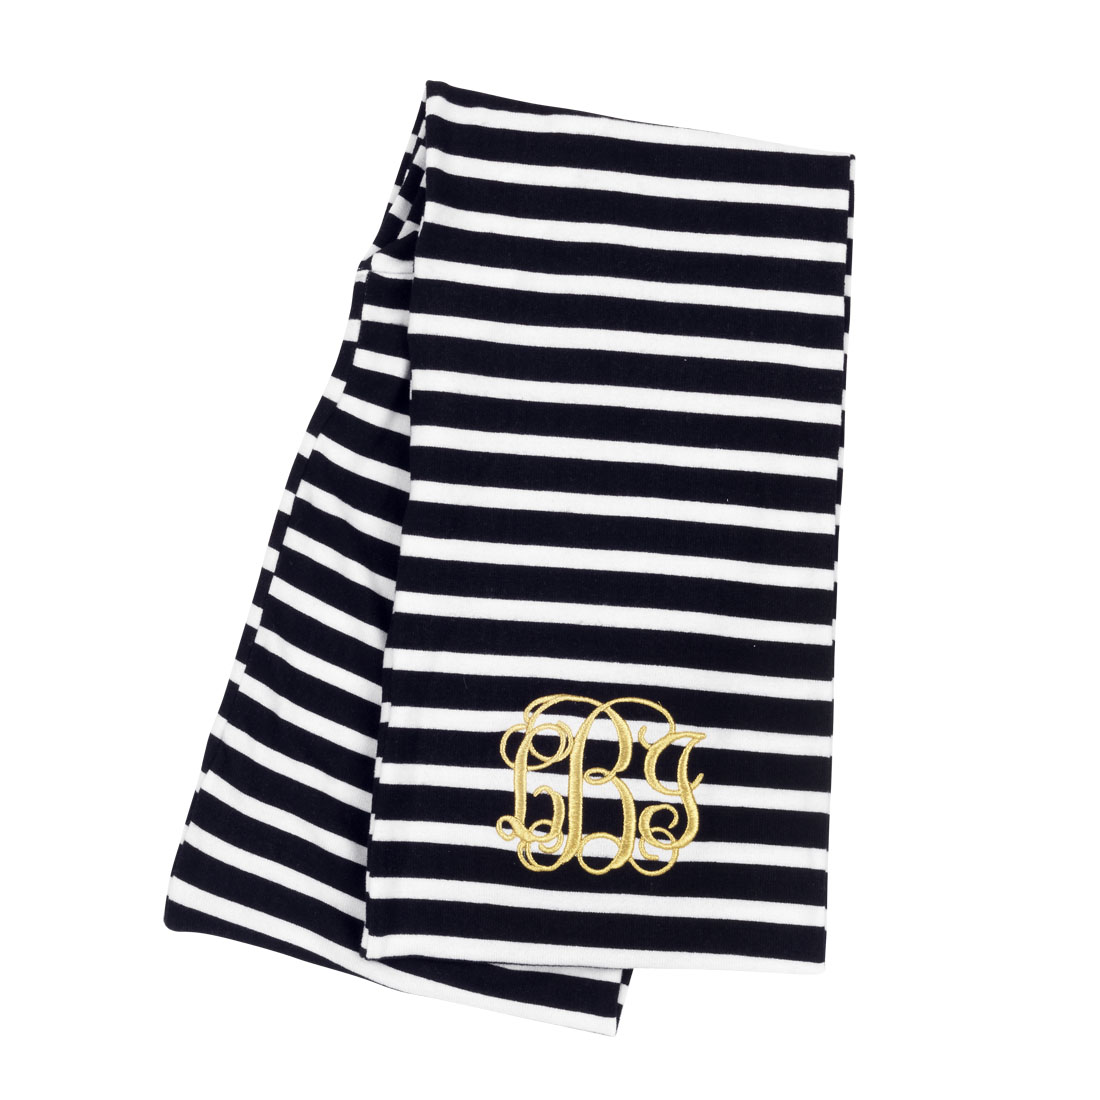 Black striped infinity scarf